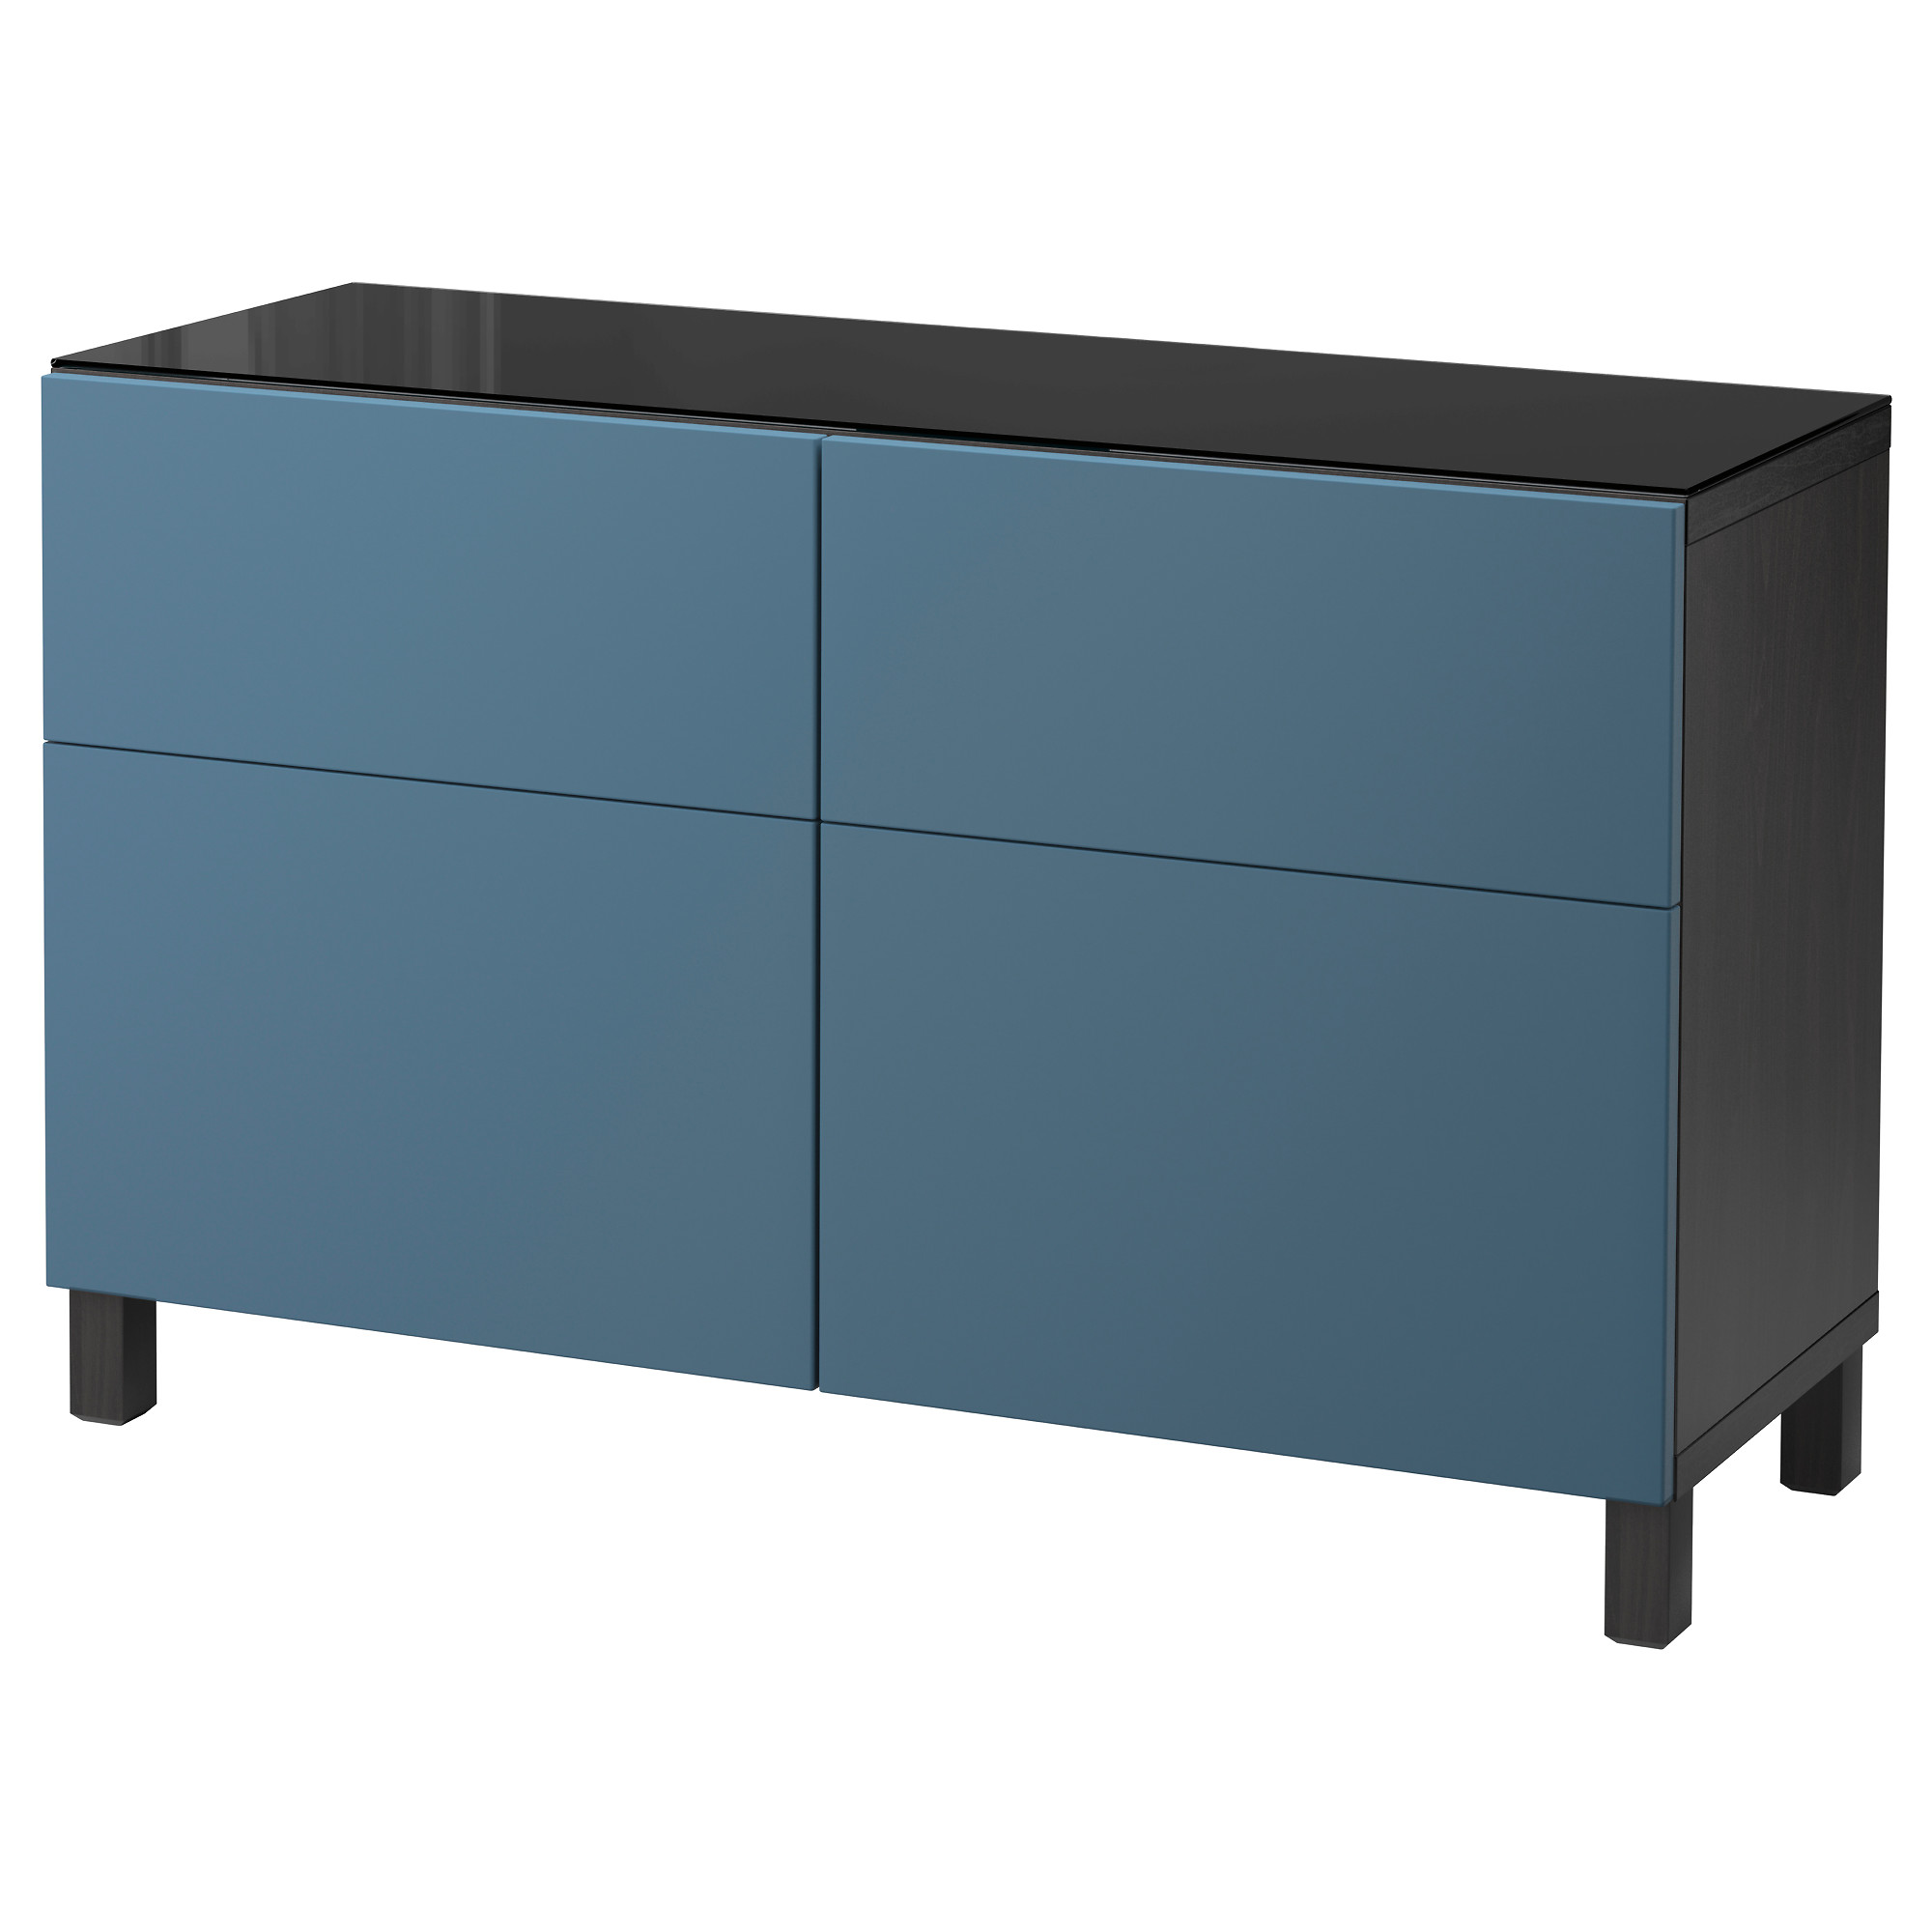 Комбинация для хранения с ящиками БЕСТО темно-синий артикуль № 092.452.44 в наличии. Online магазин IKEA Беларусь. Недорогая доставка и соборка.